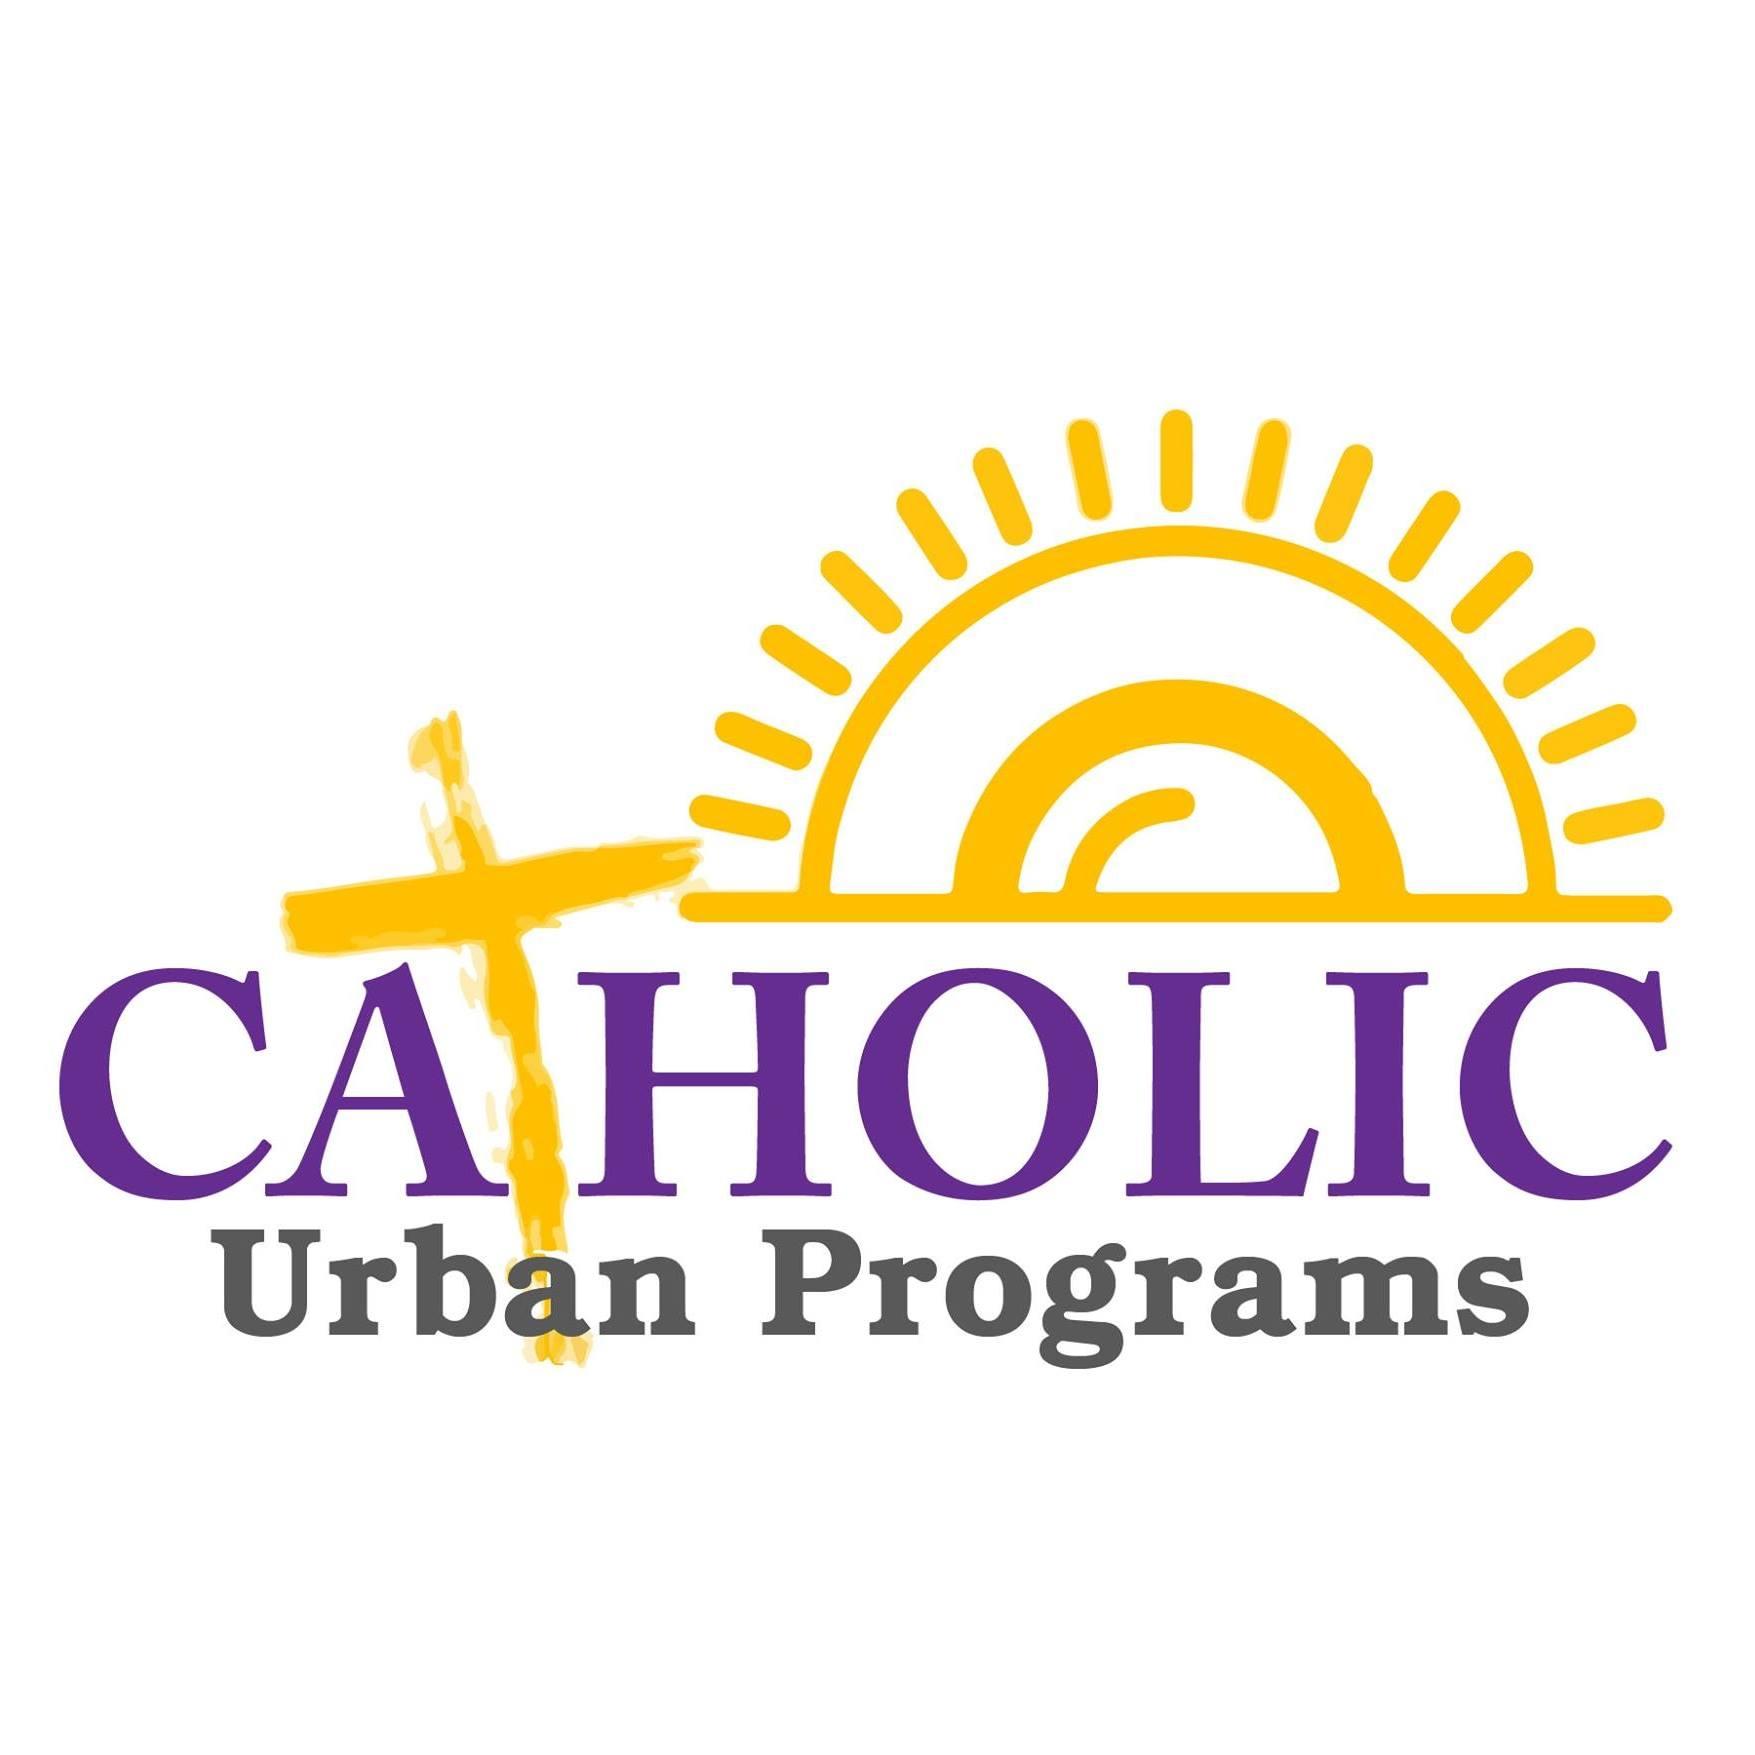 Catholic Urban Programs (CUP) Food Pantry